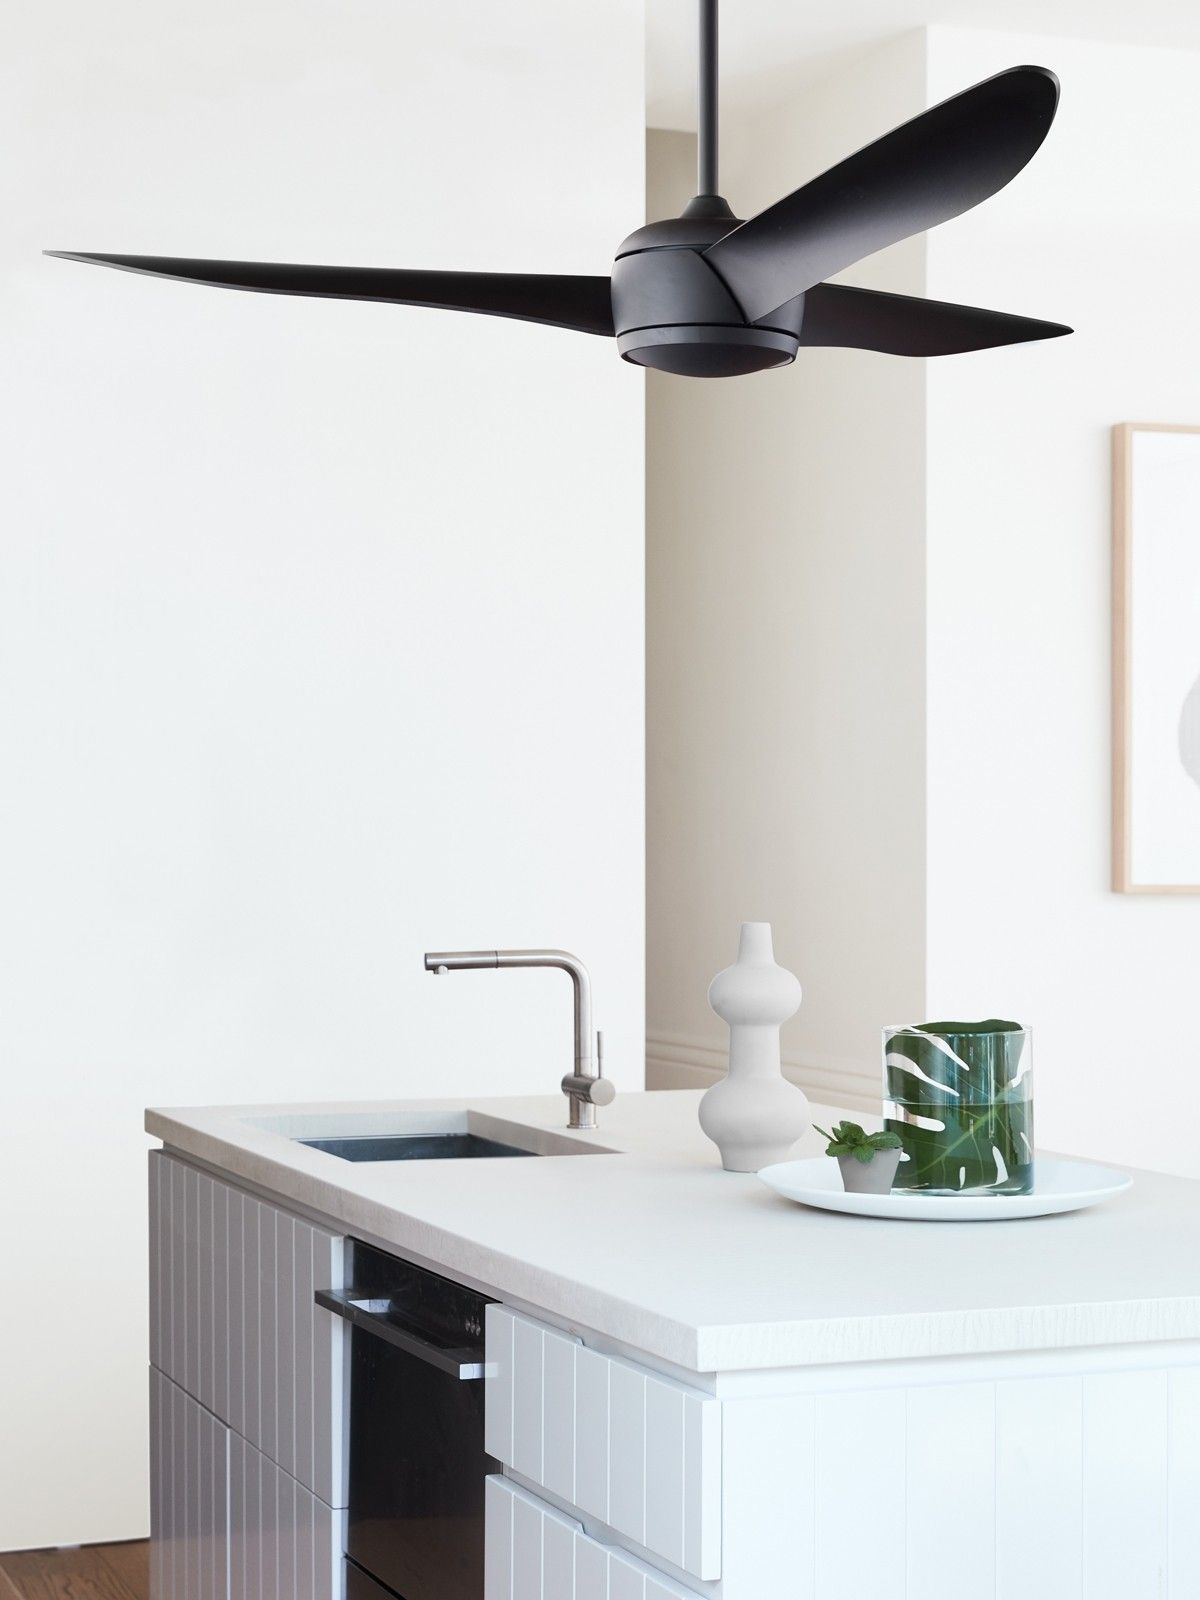 Nordic 142cm Fan Only in Black Ceiling fan with remote